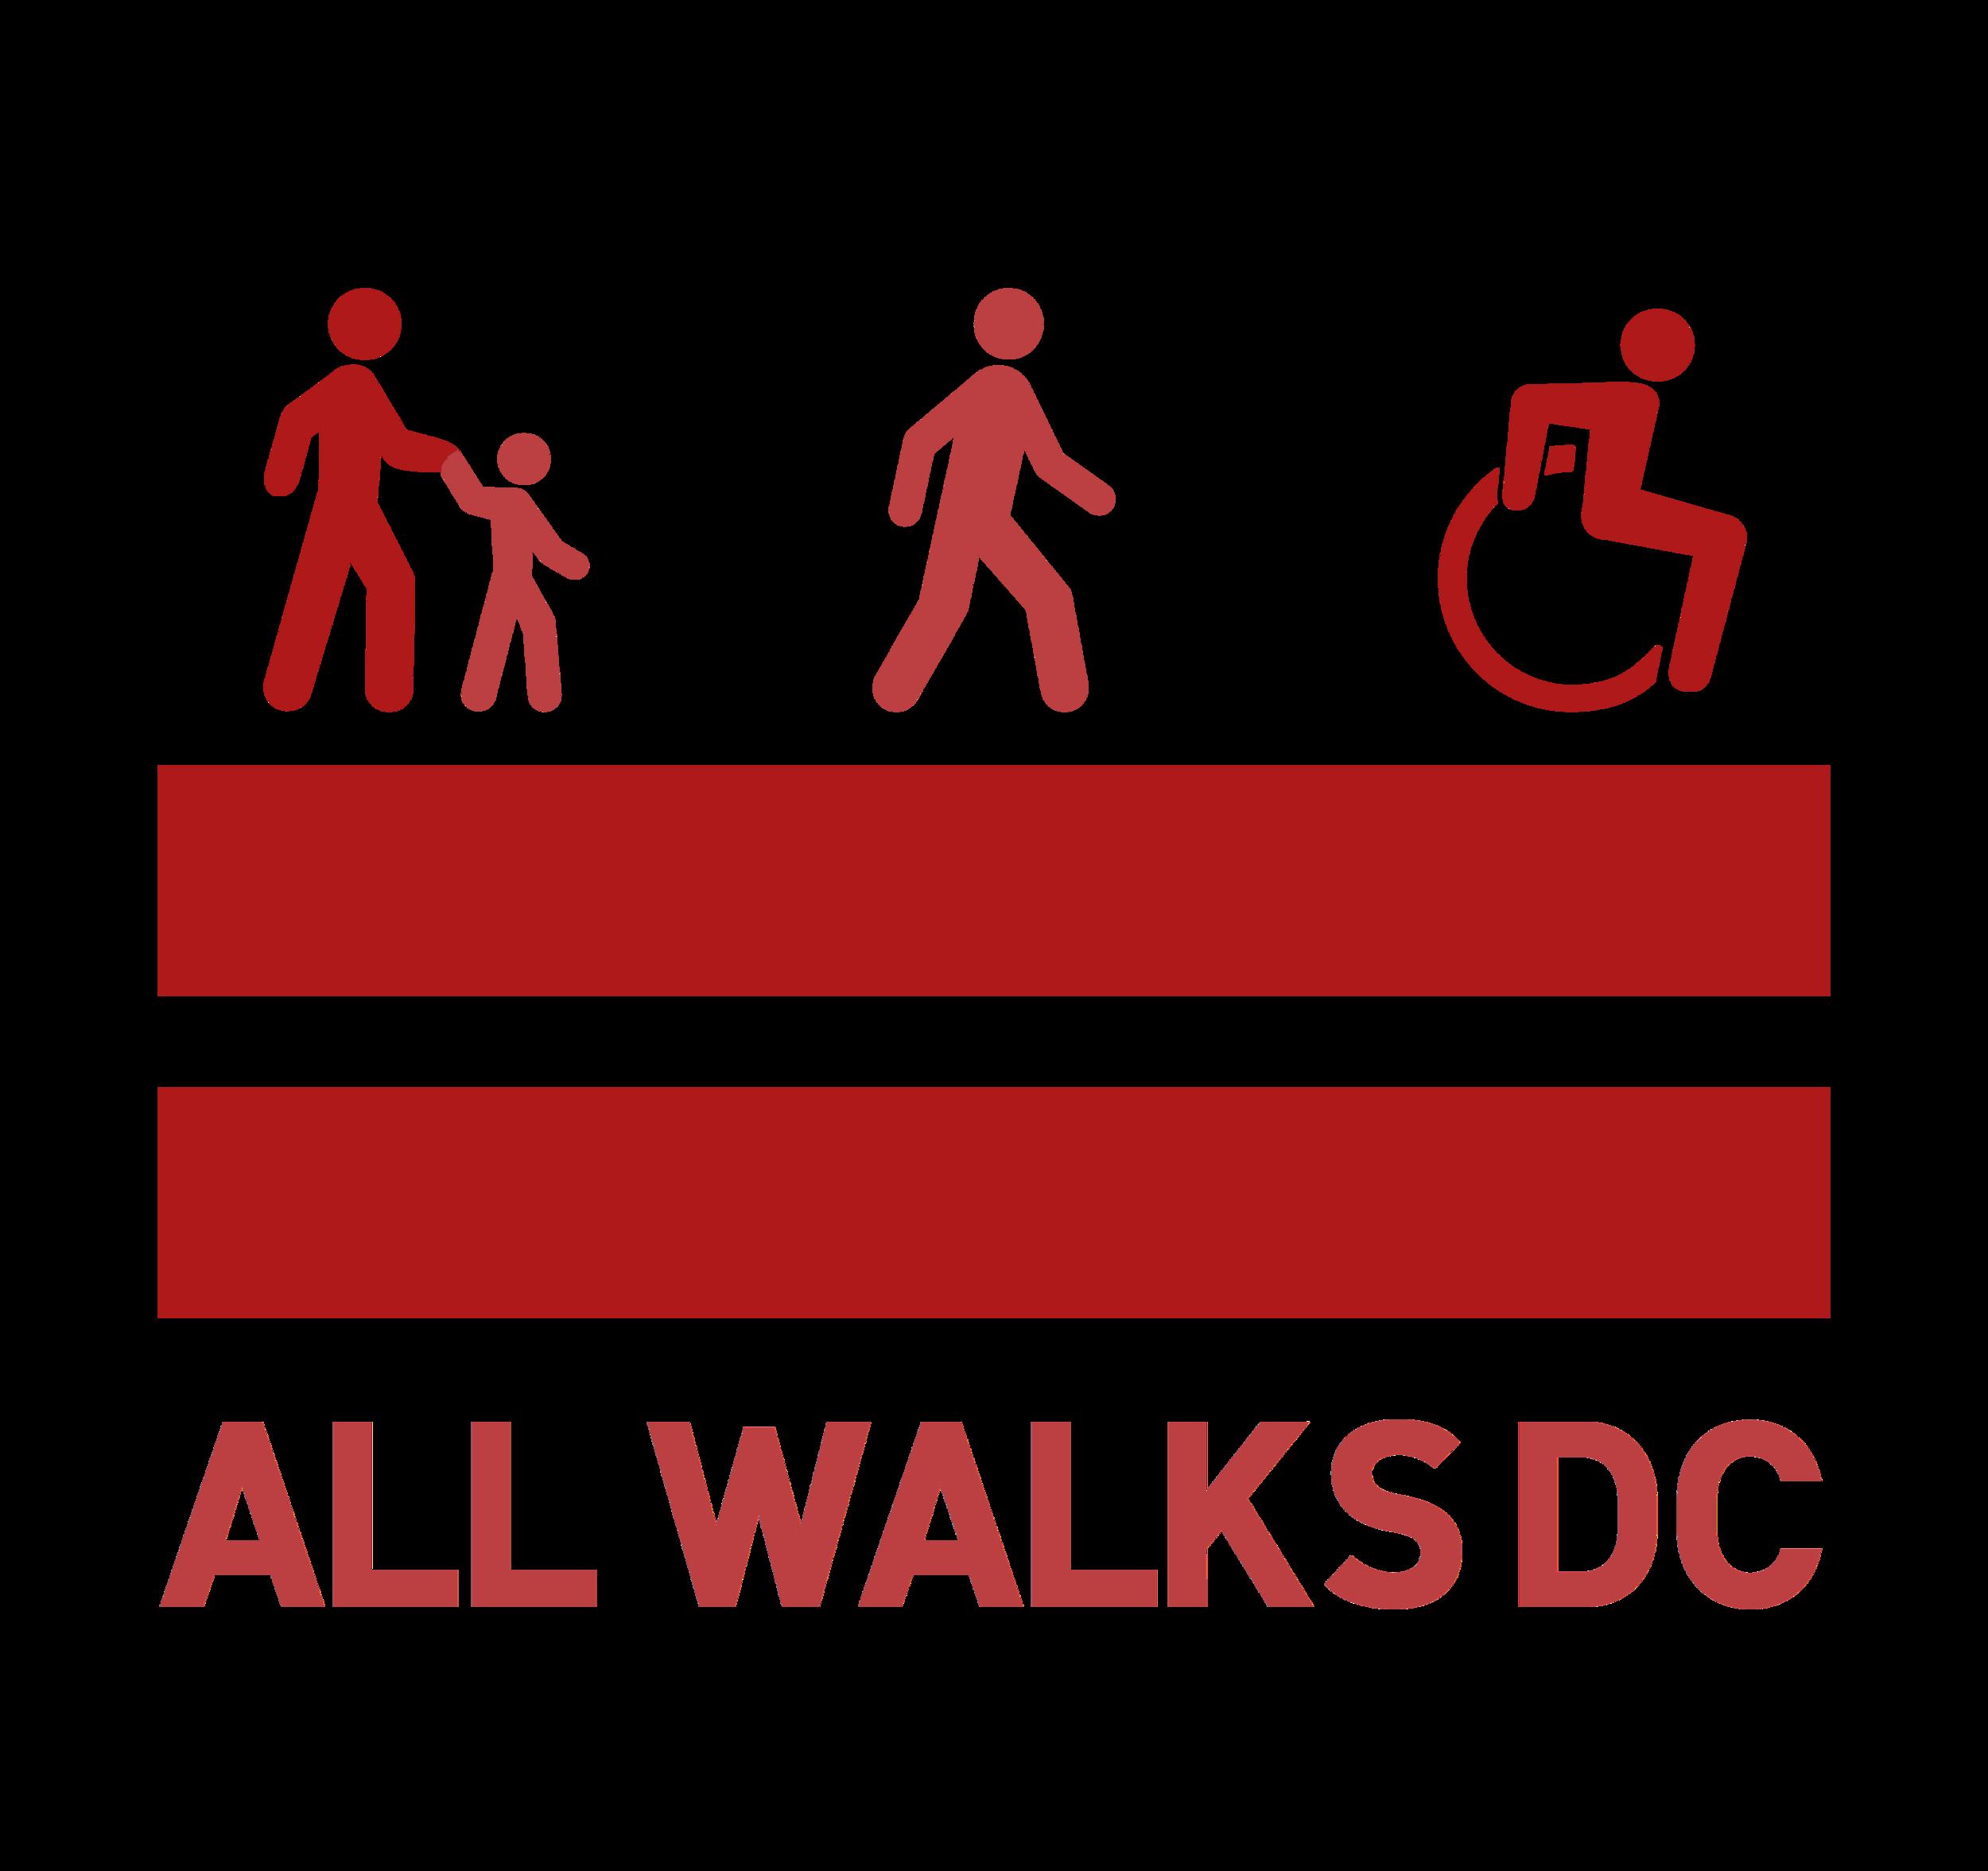 allwalksdc-logo-png.png